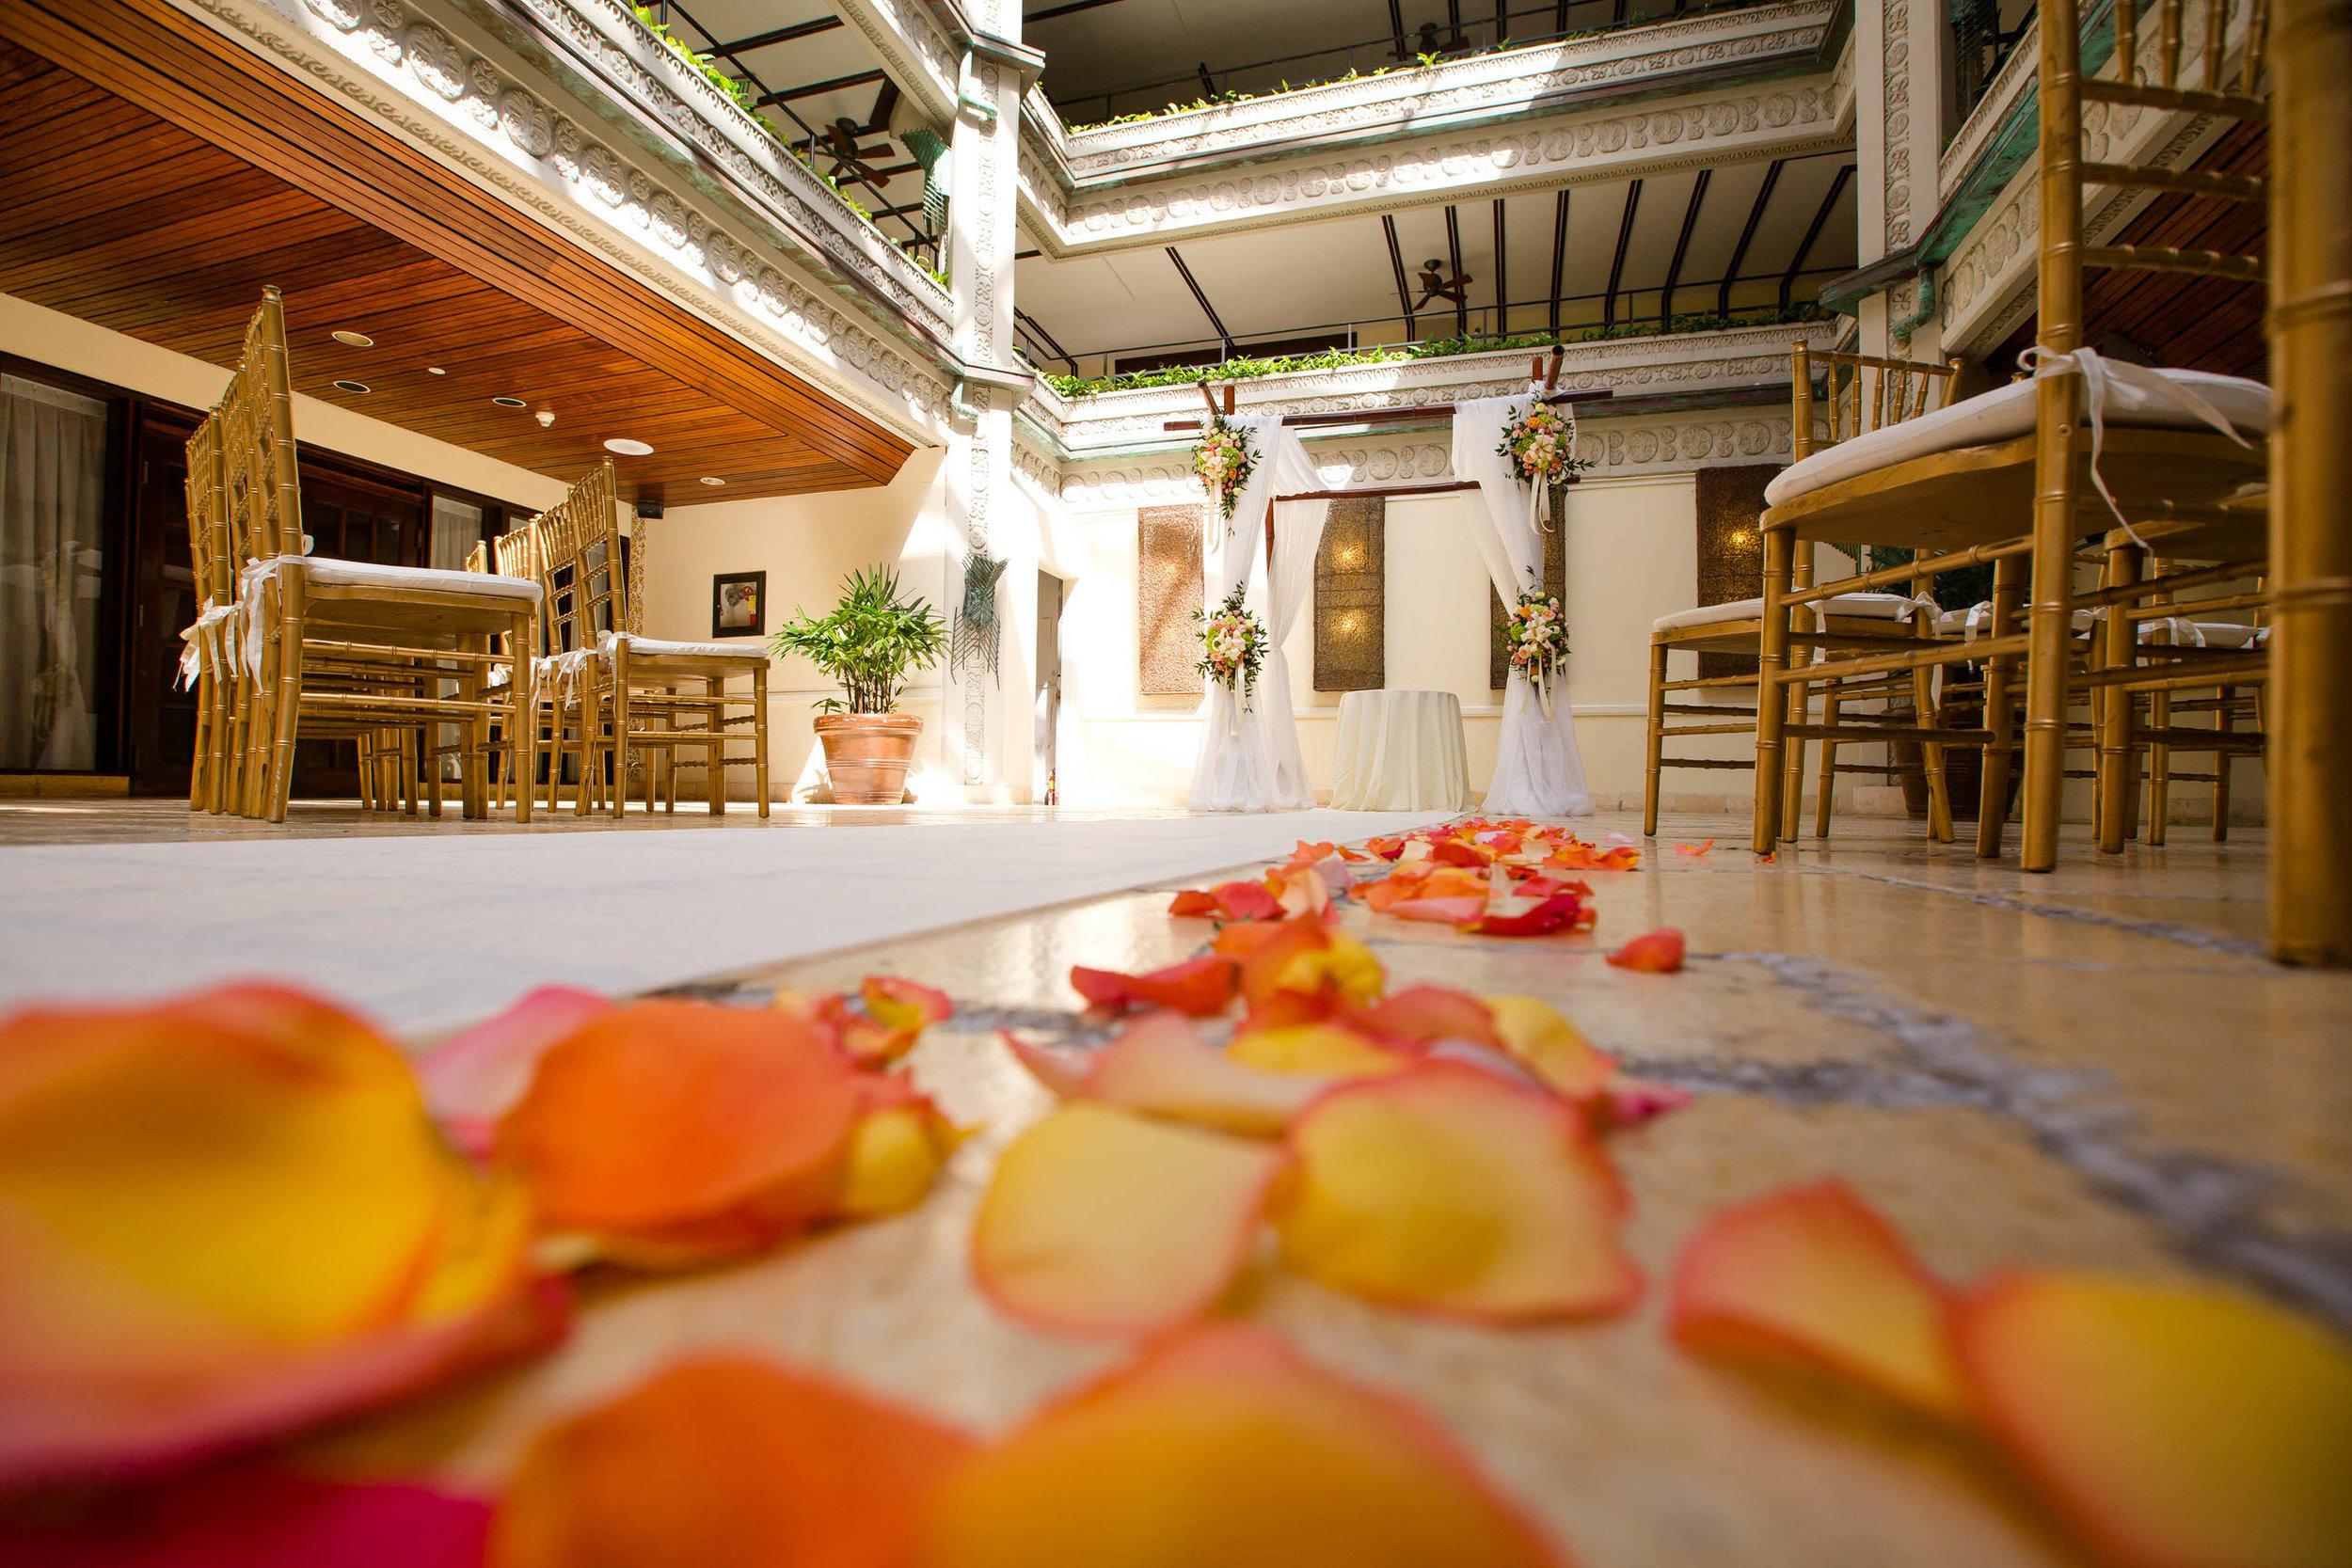 petals-wedding-ceremony-details-tiny-house-photo-mayfair-hotel-miami.jpg